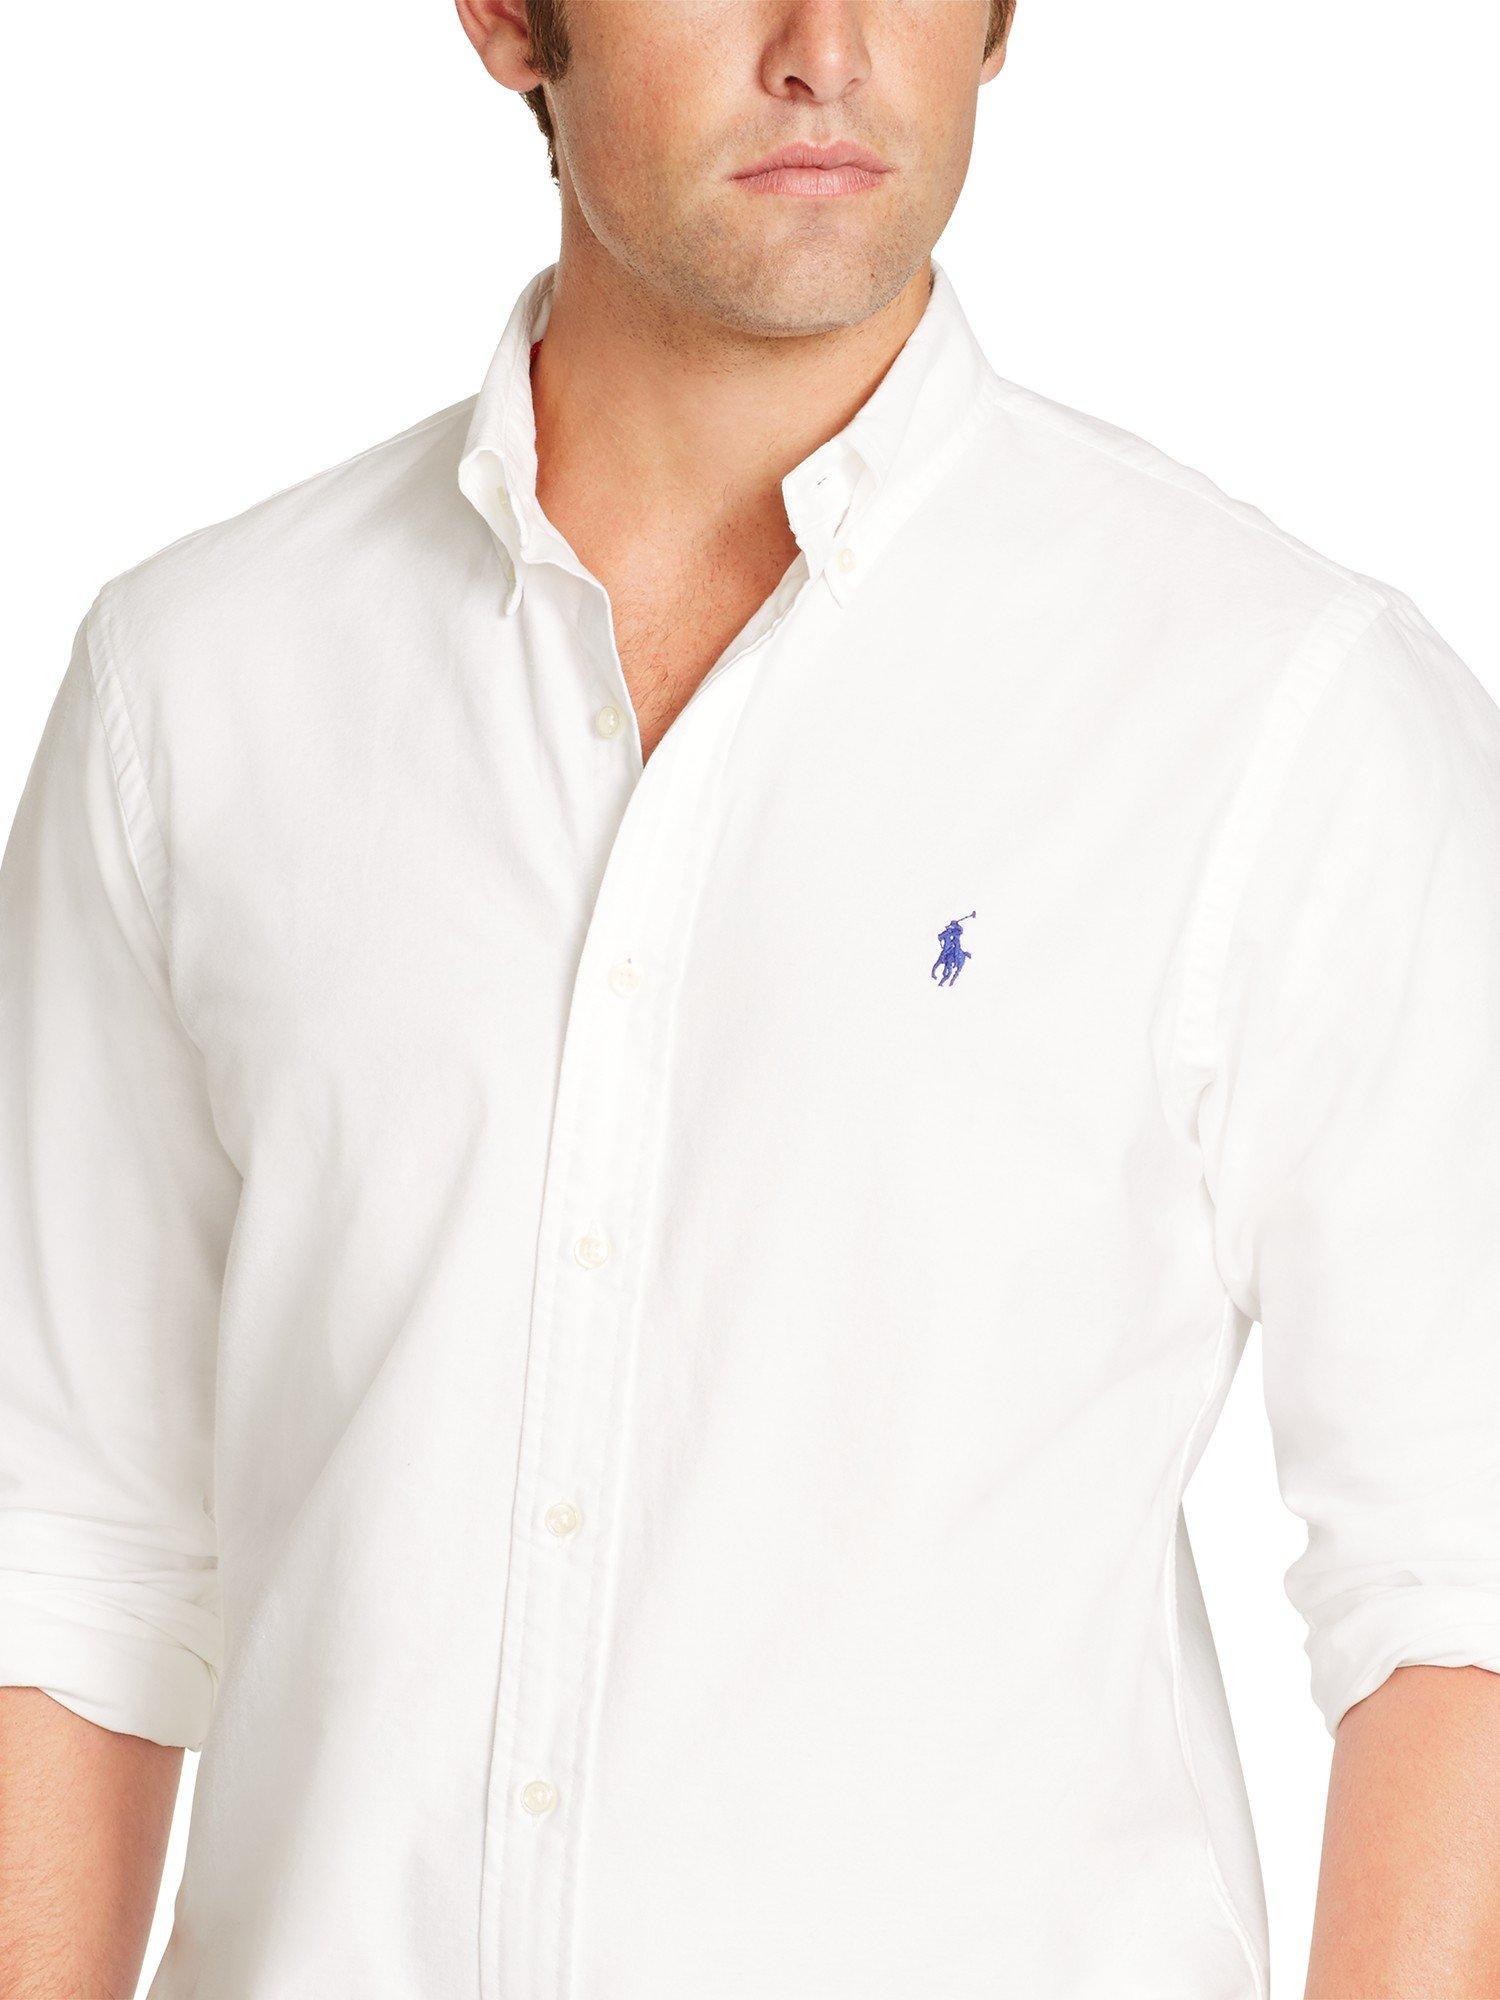 19632f069c7a0 ... store polo ralph lauren slim fit oxford shirt in white for men lyst  2cbb4 b9cda